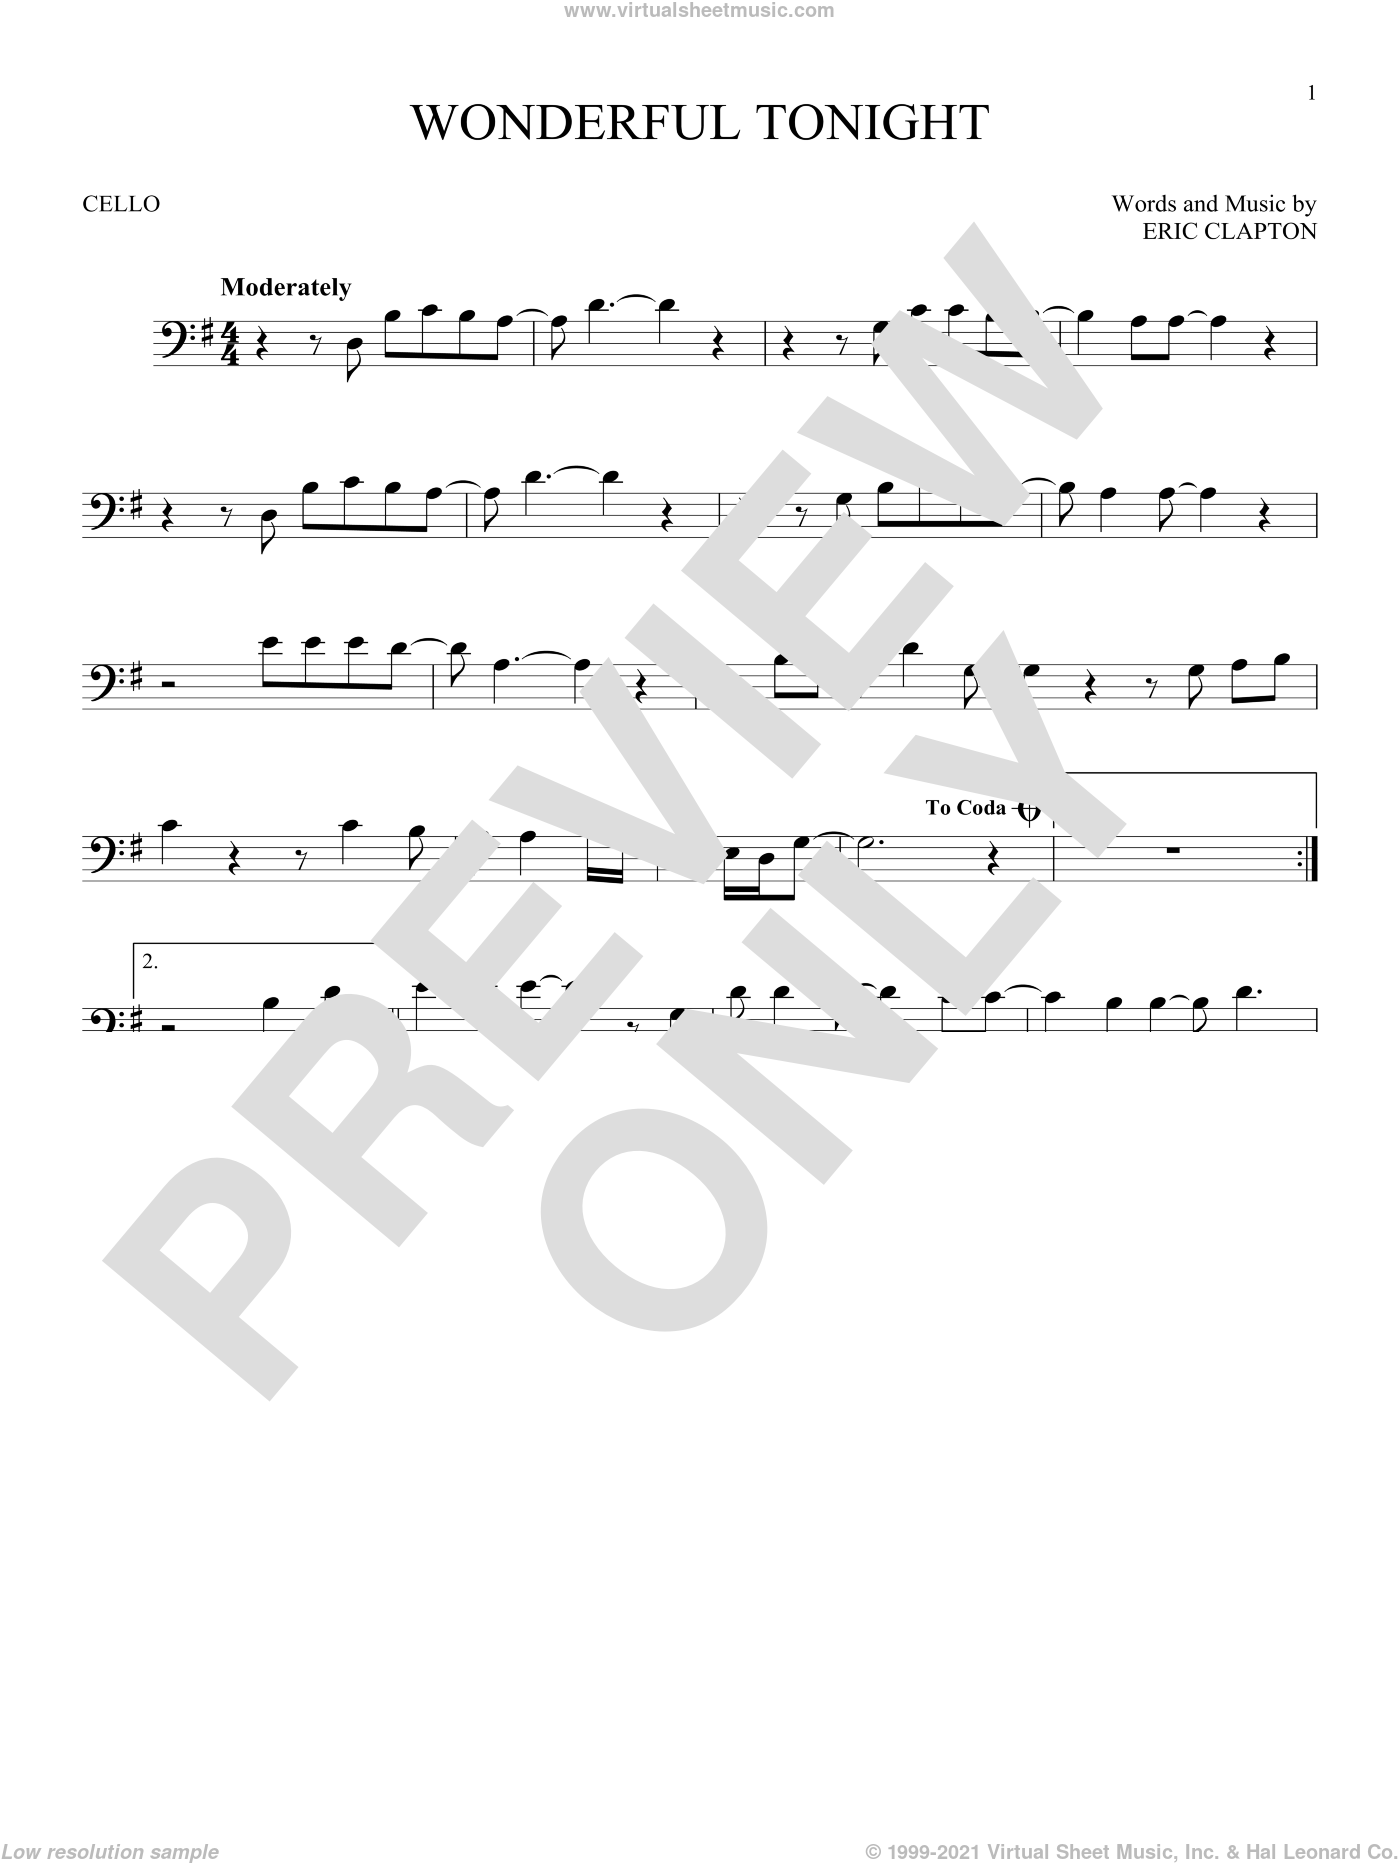 Wonderful Tonight sheet music for cello solo by Eric Clapton and David Kersh, wedding score, intermediate skill level